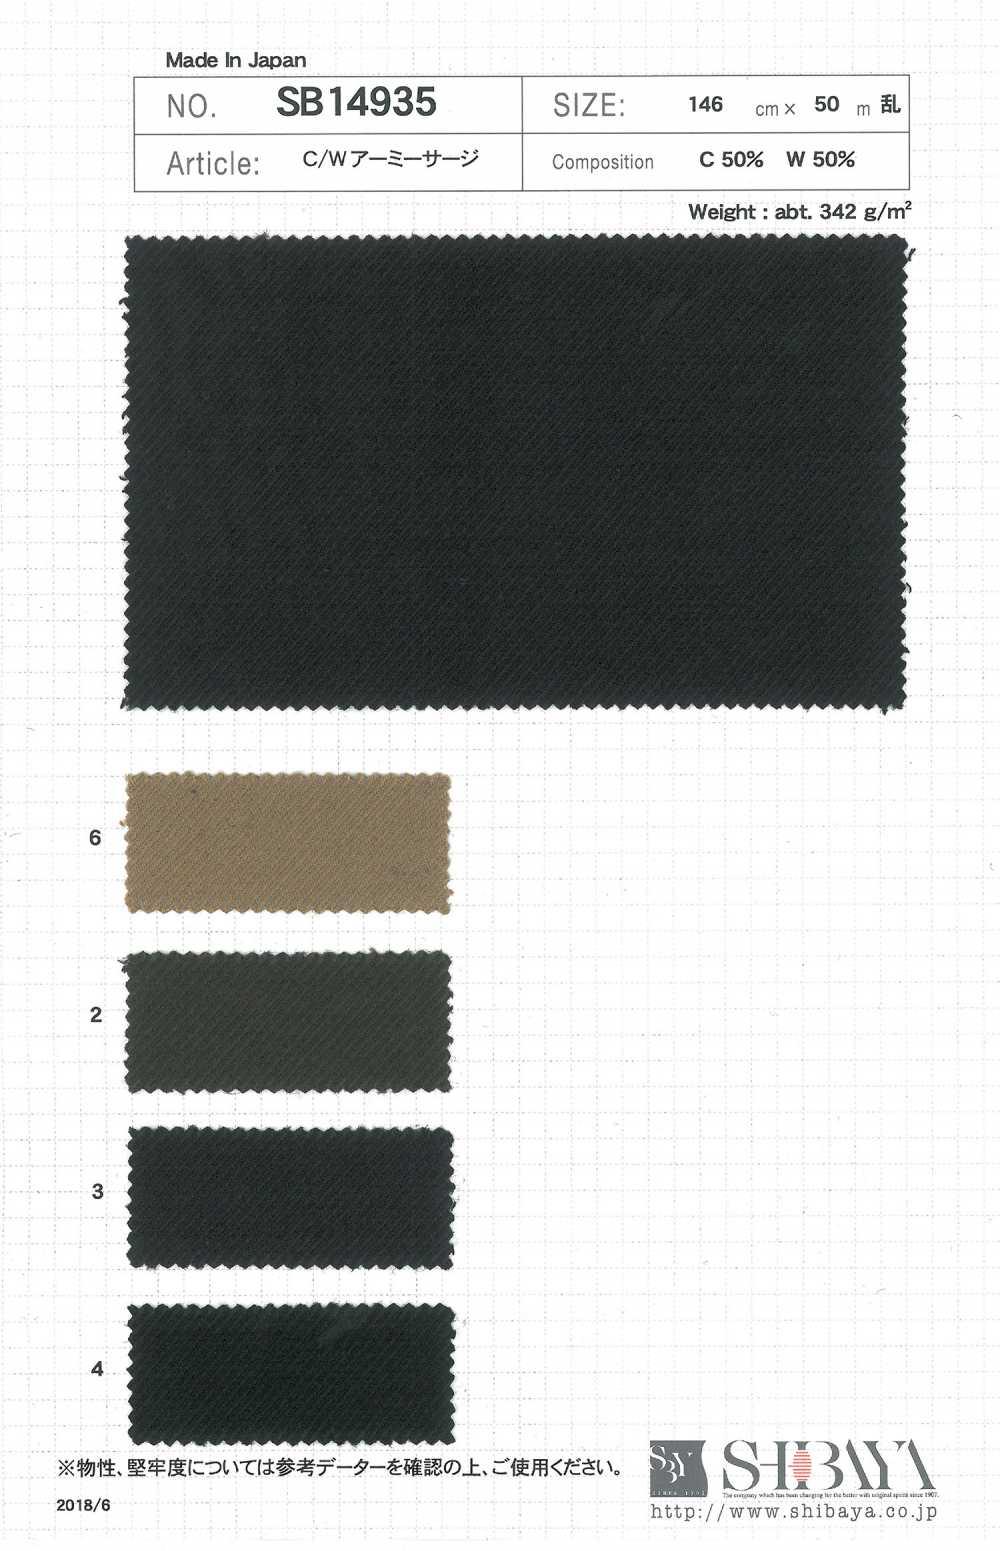 SB14935 C/W アーミーサージ[生地] 柴屋/オークラ商事 - ApparelX アパレル資材卸通販